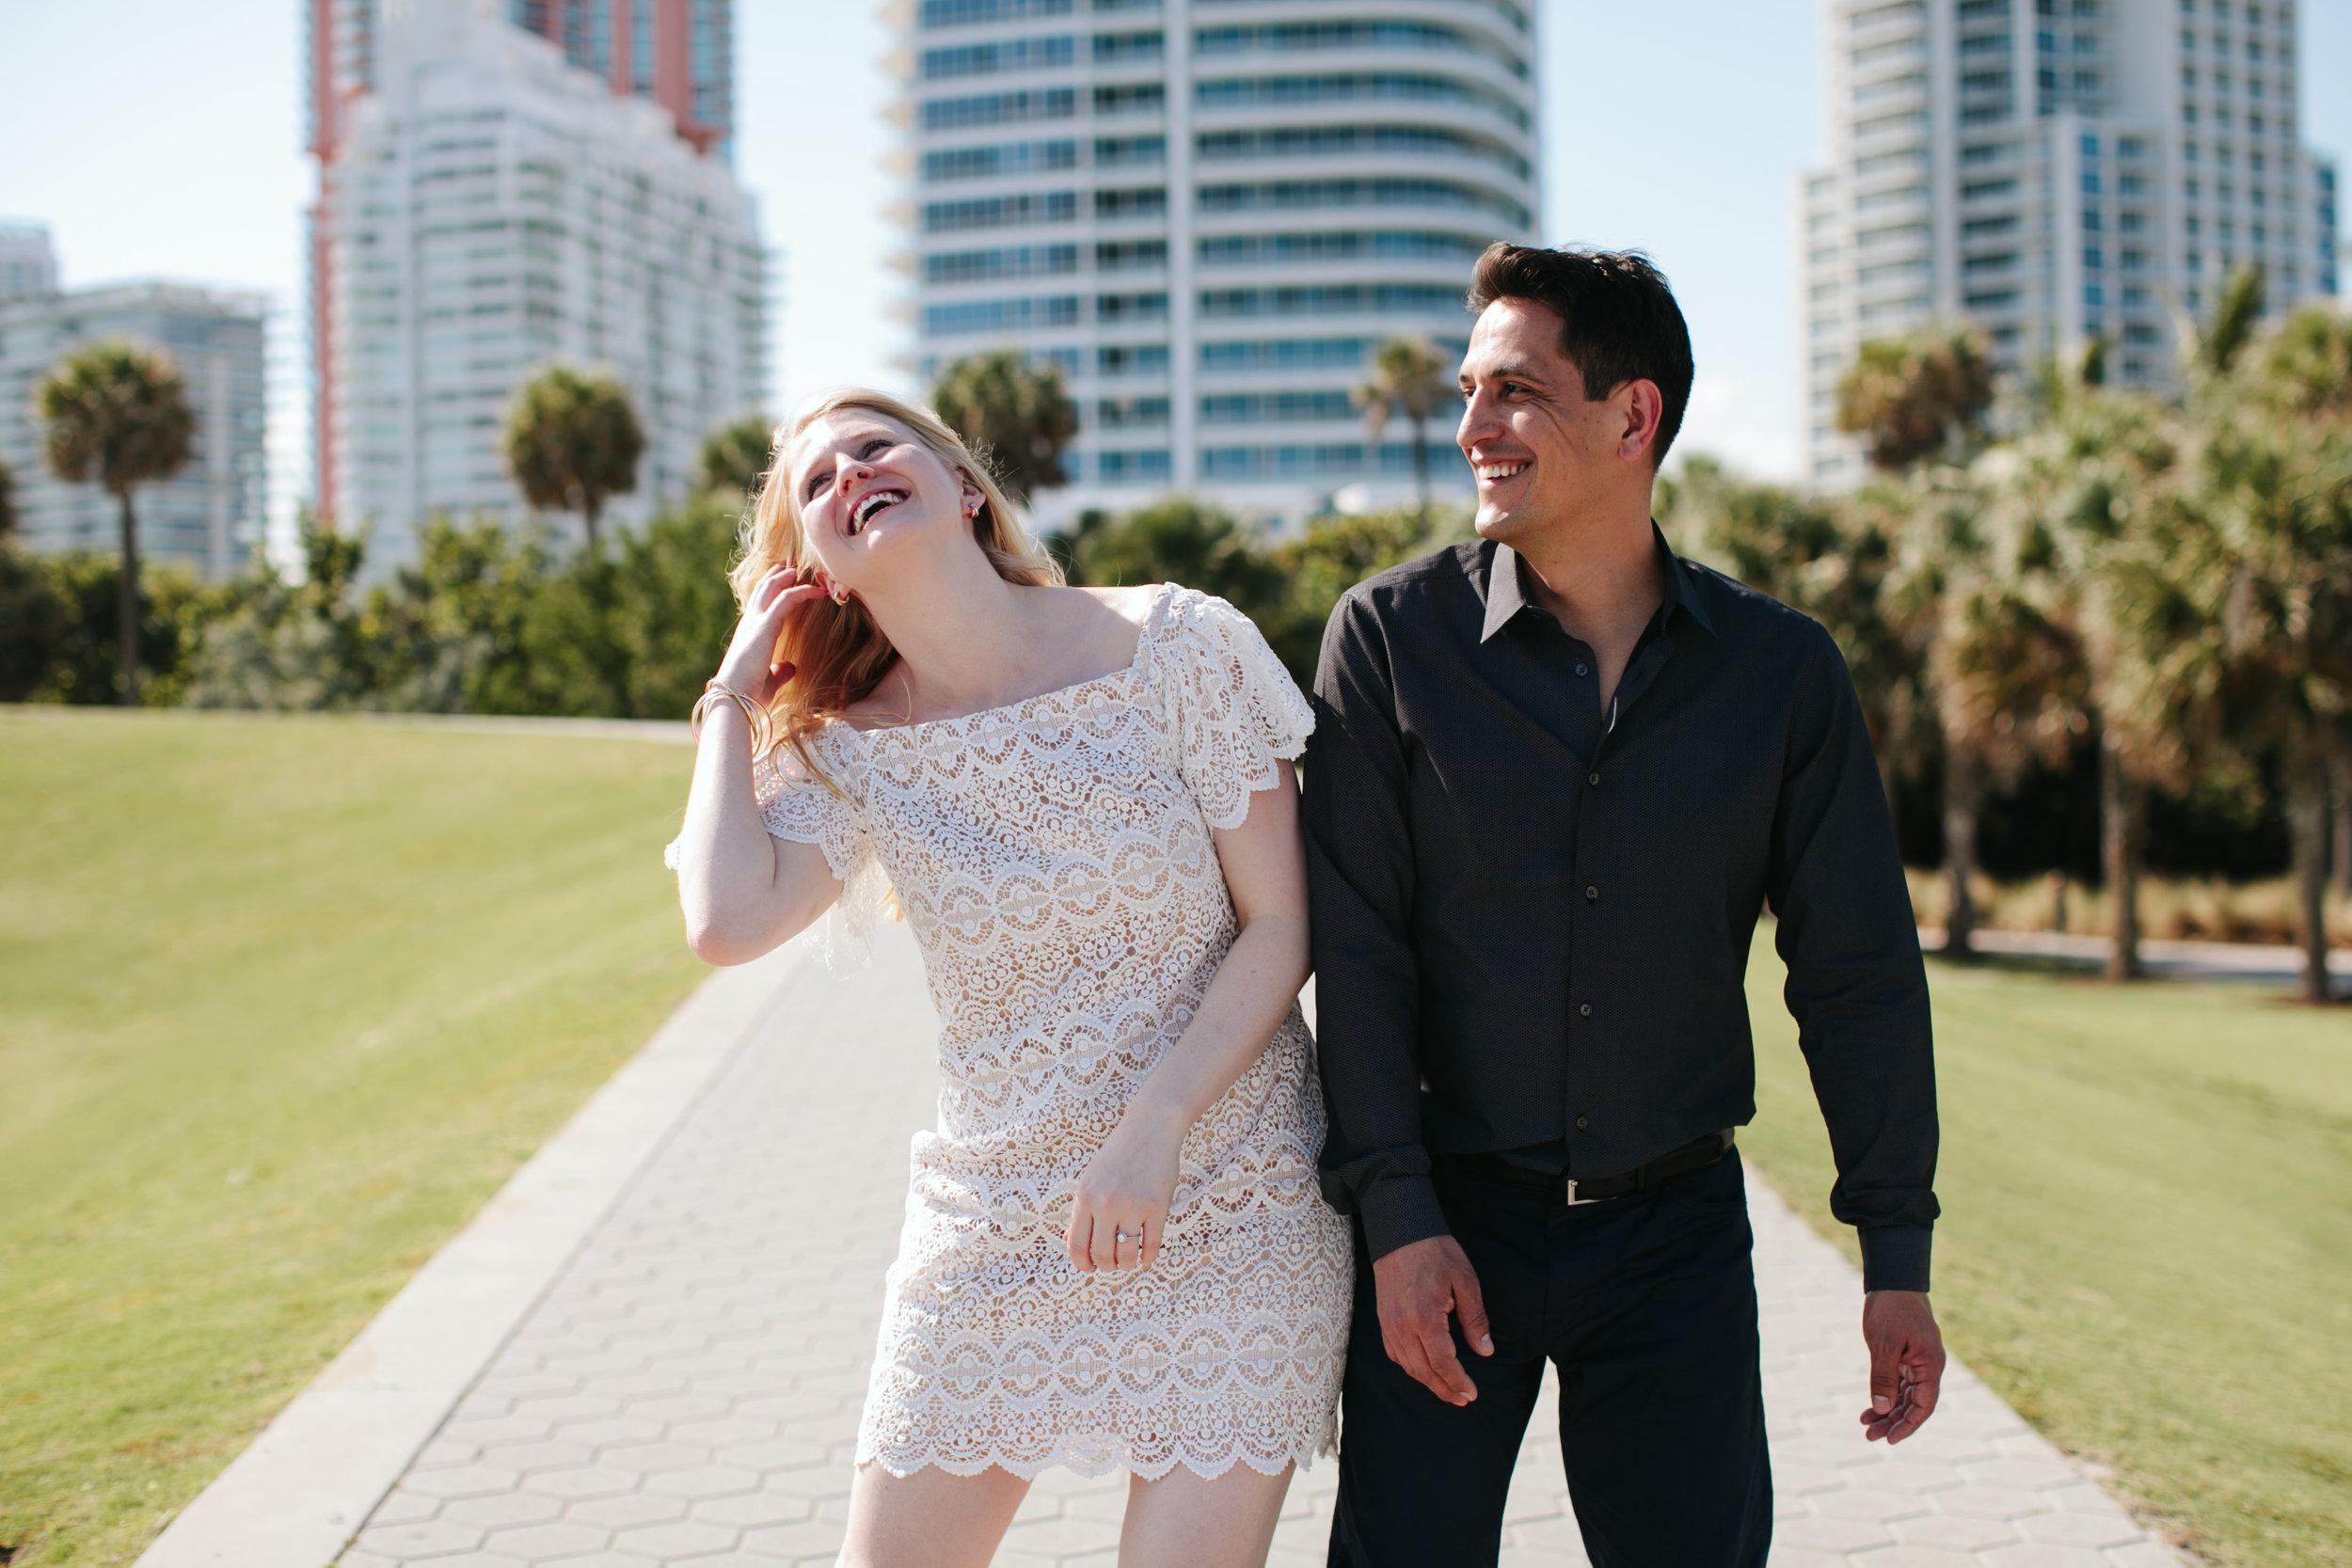 Miami Beach Engagement at South Pointe Park (18).jpg